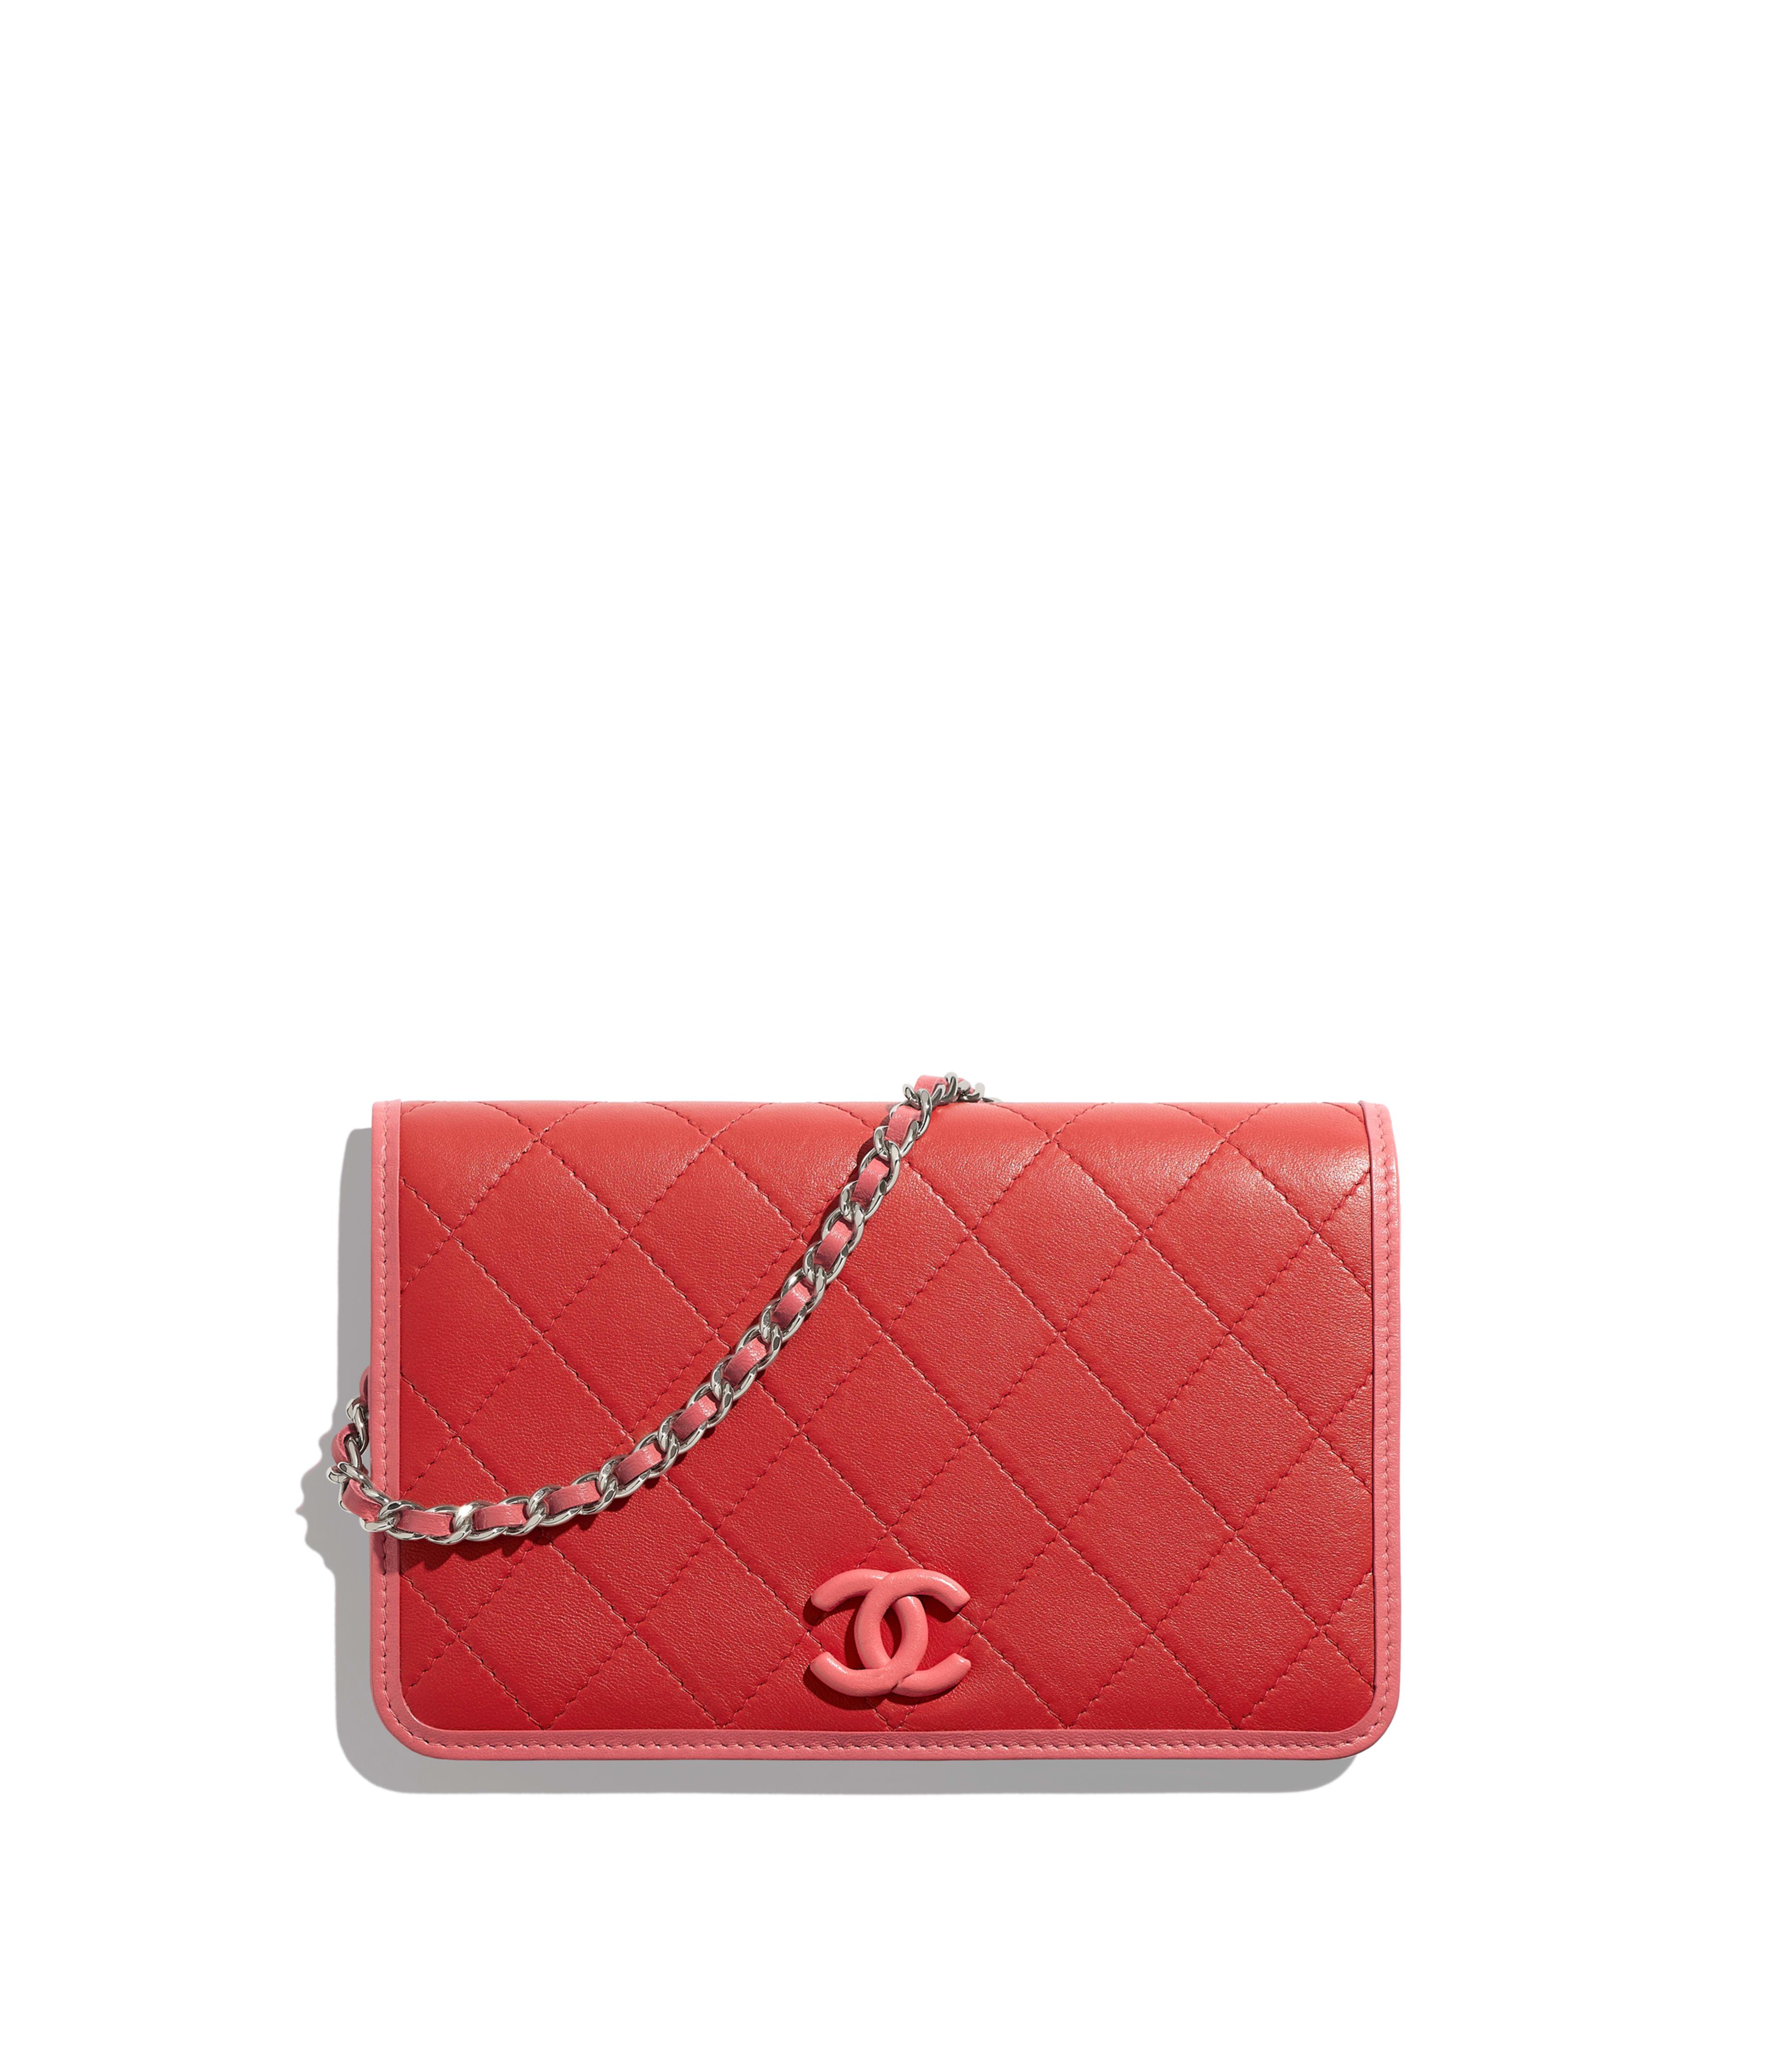 8a80225c14fde9 Wallet on Chain Lambskin & Silver-Tone Metal, Red & Pink Ref.  AP0059B00050N0437